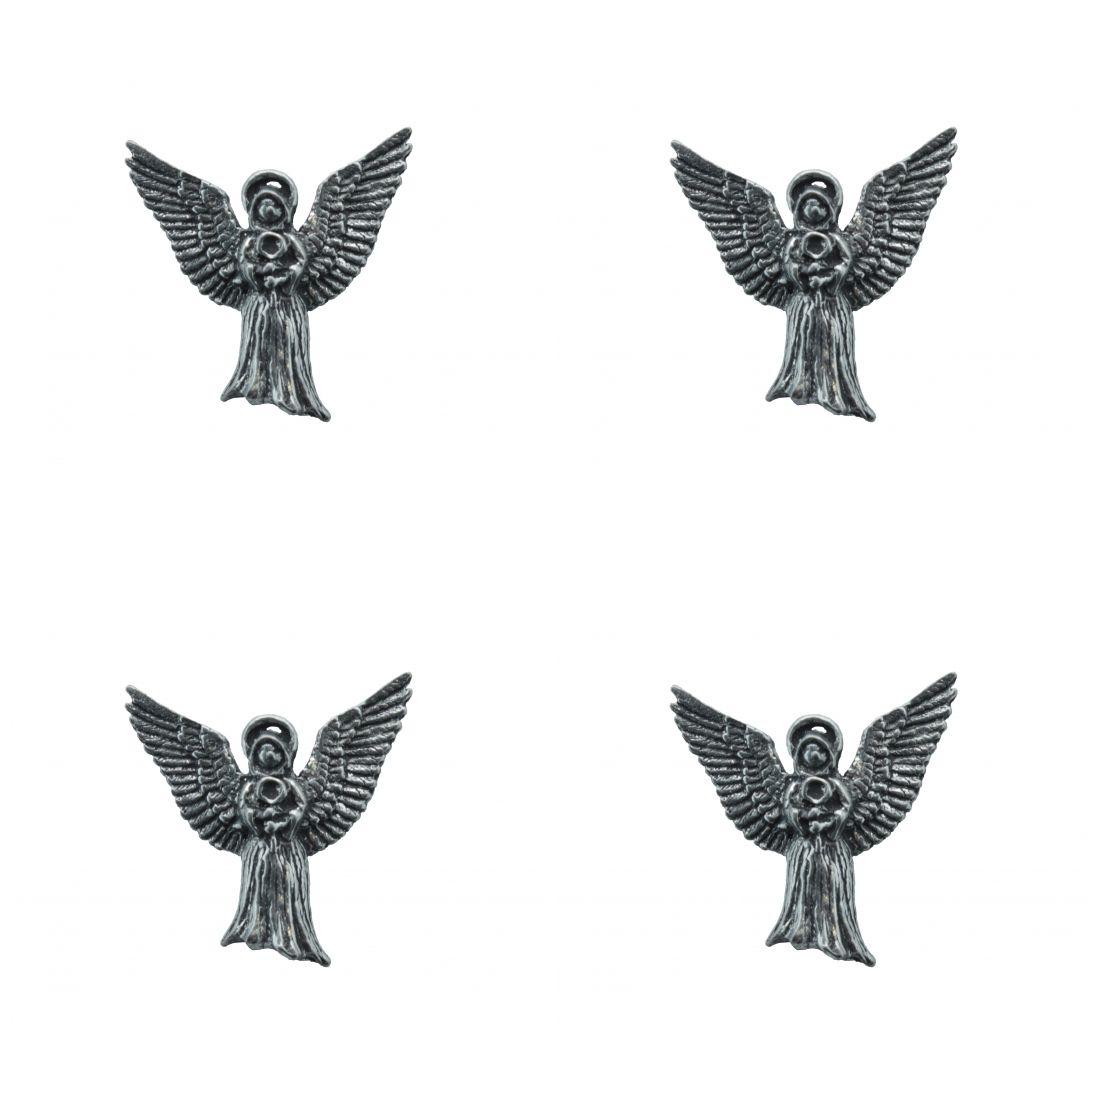 4 x Pin Anstecker Badge Engel Flügel geöffnet 2,6x2,4cm